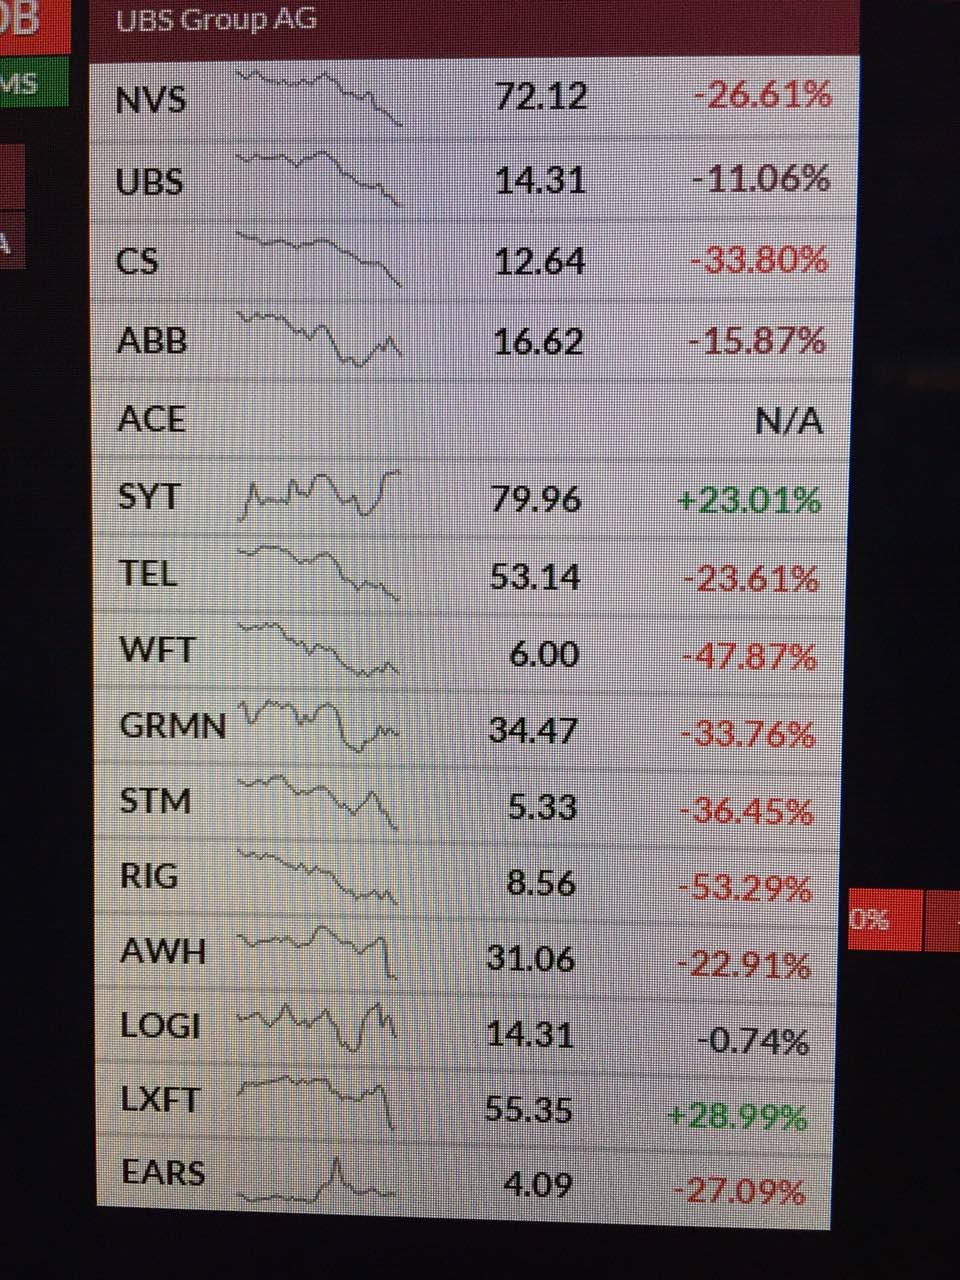 Цена на нефть марки Brent упала ниже 30 долларов за баррель - Цензор.НЕТ 7959